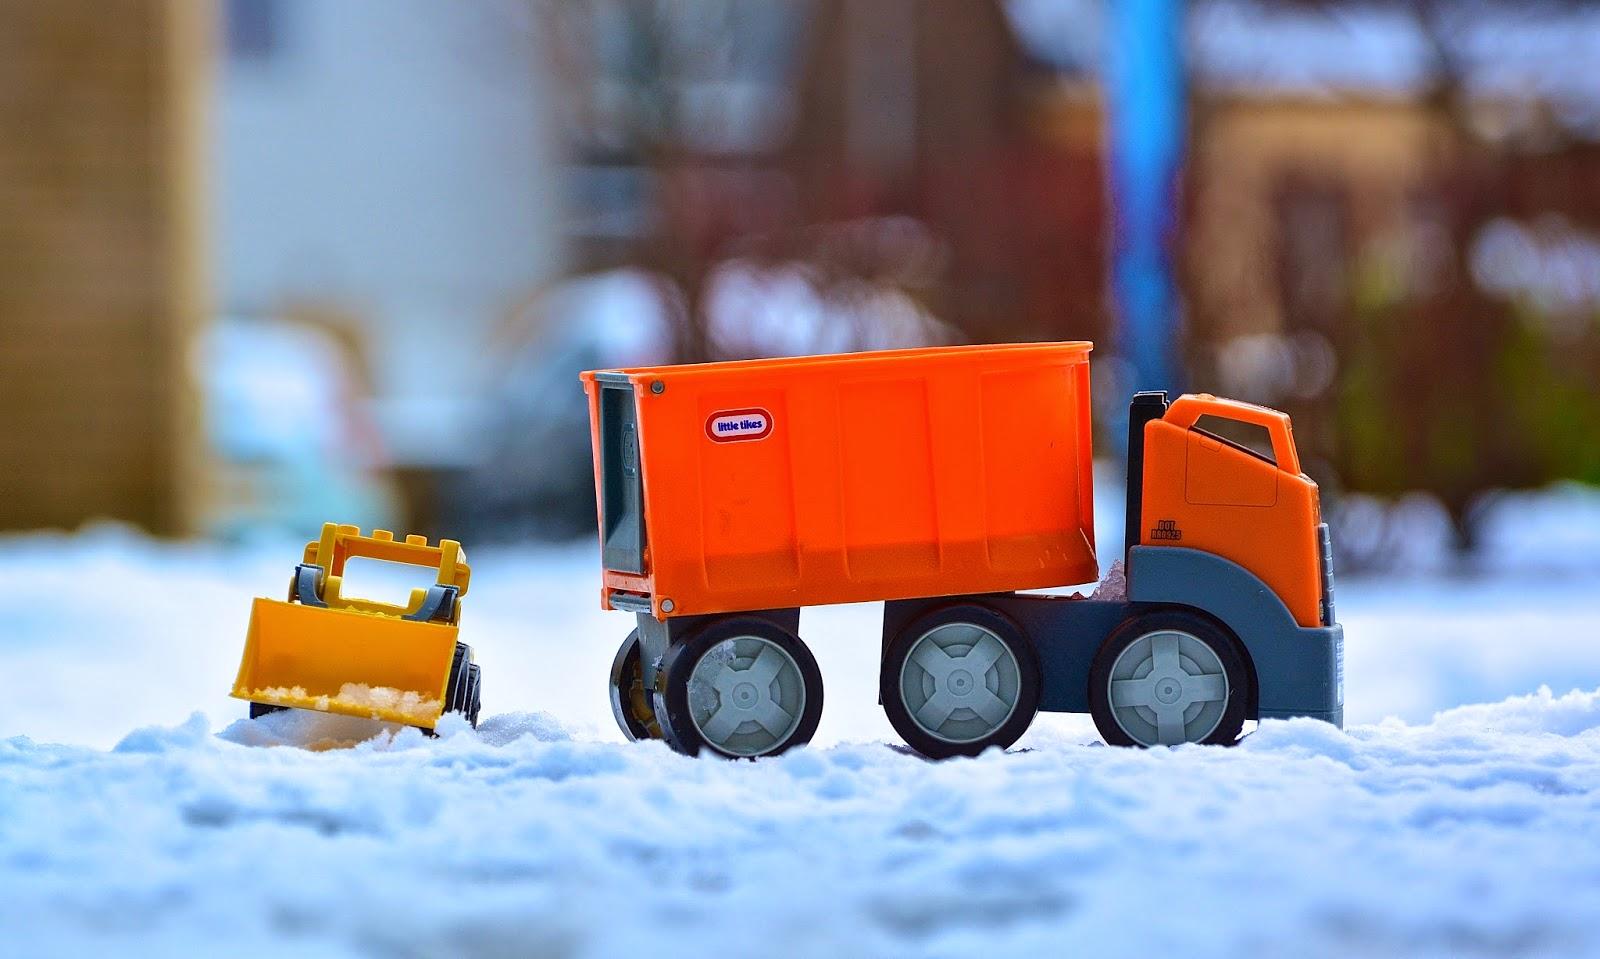 Trucks in the snow